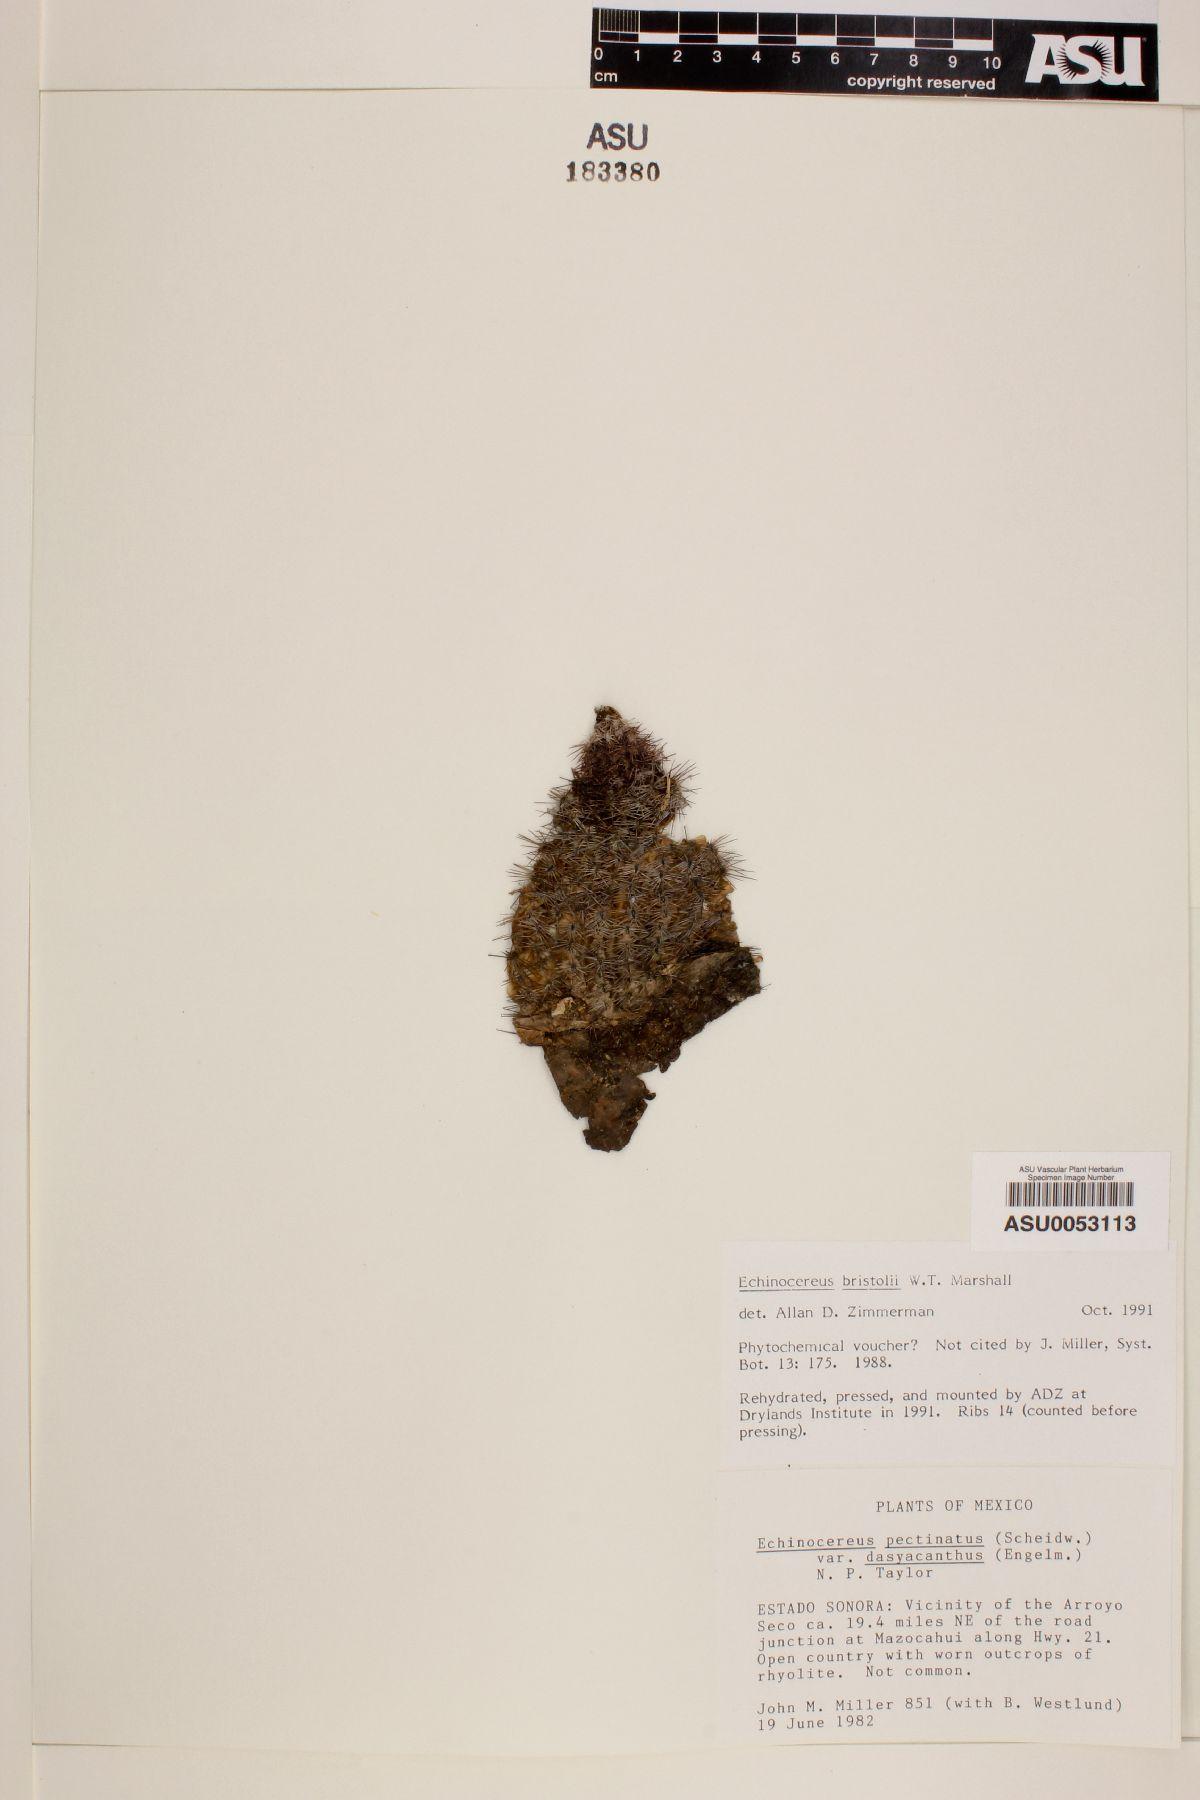 Echinocereus bristolii image